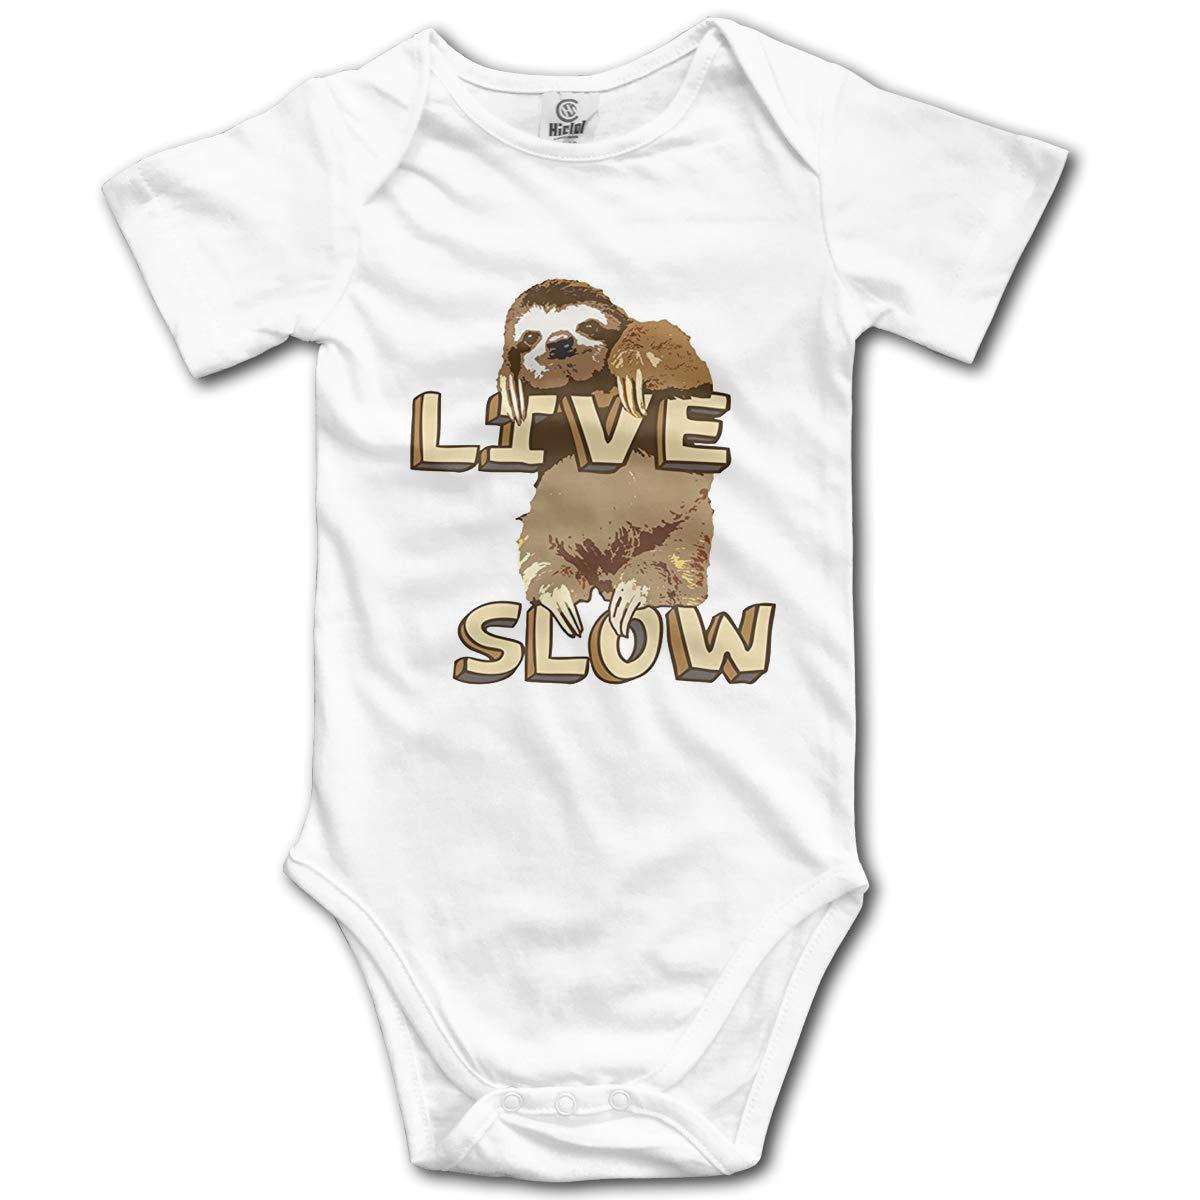 CHETI Cute Sloth Live Slow Newborn Infant Toddler Baby Girls Boys Bodysuit Short Sleeve 0-24 MonthsBlack